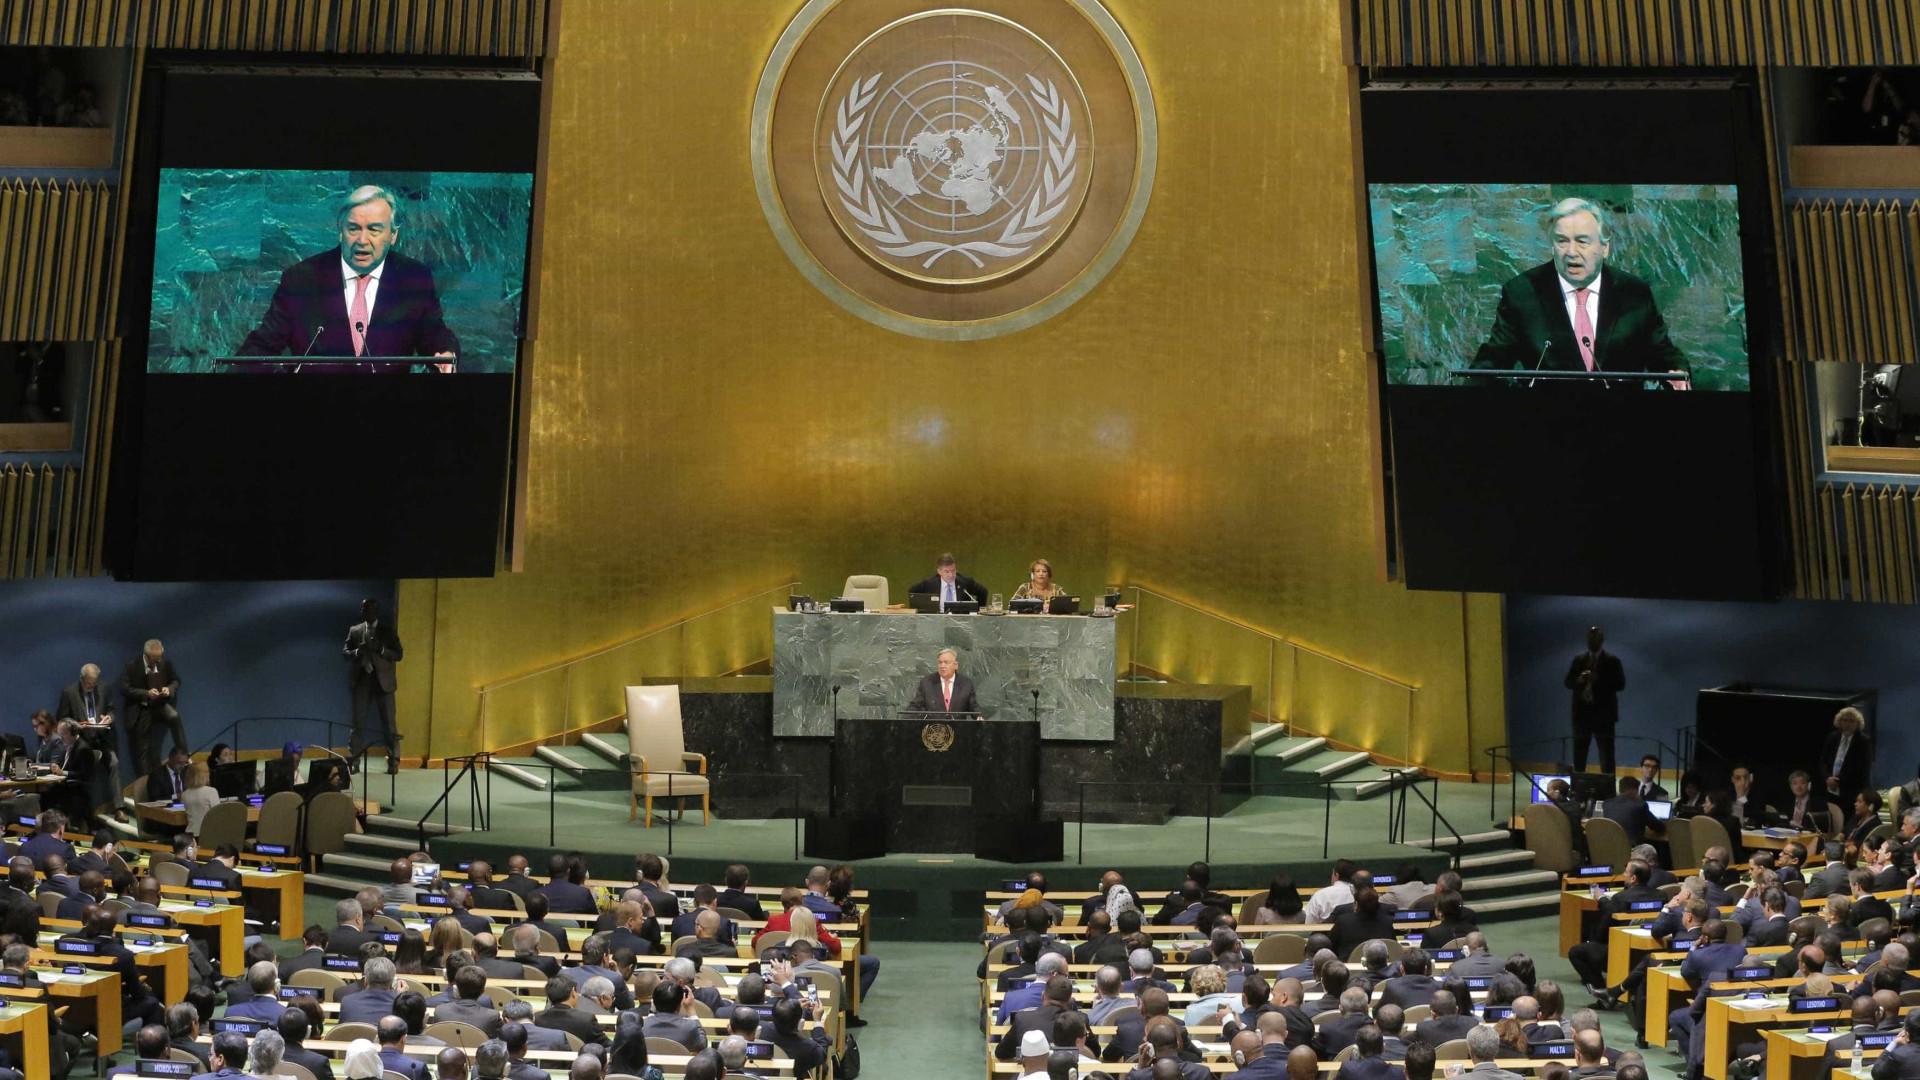 'Ameaça nuclear nunca foi tão grande', diz Guterres na ONU